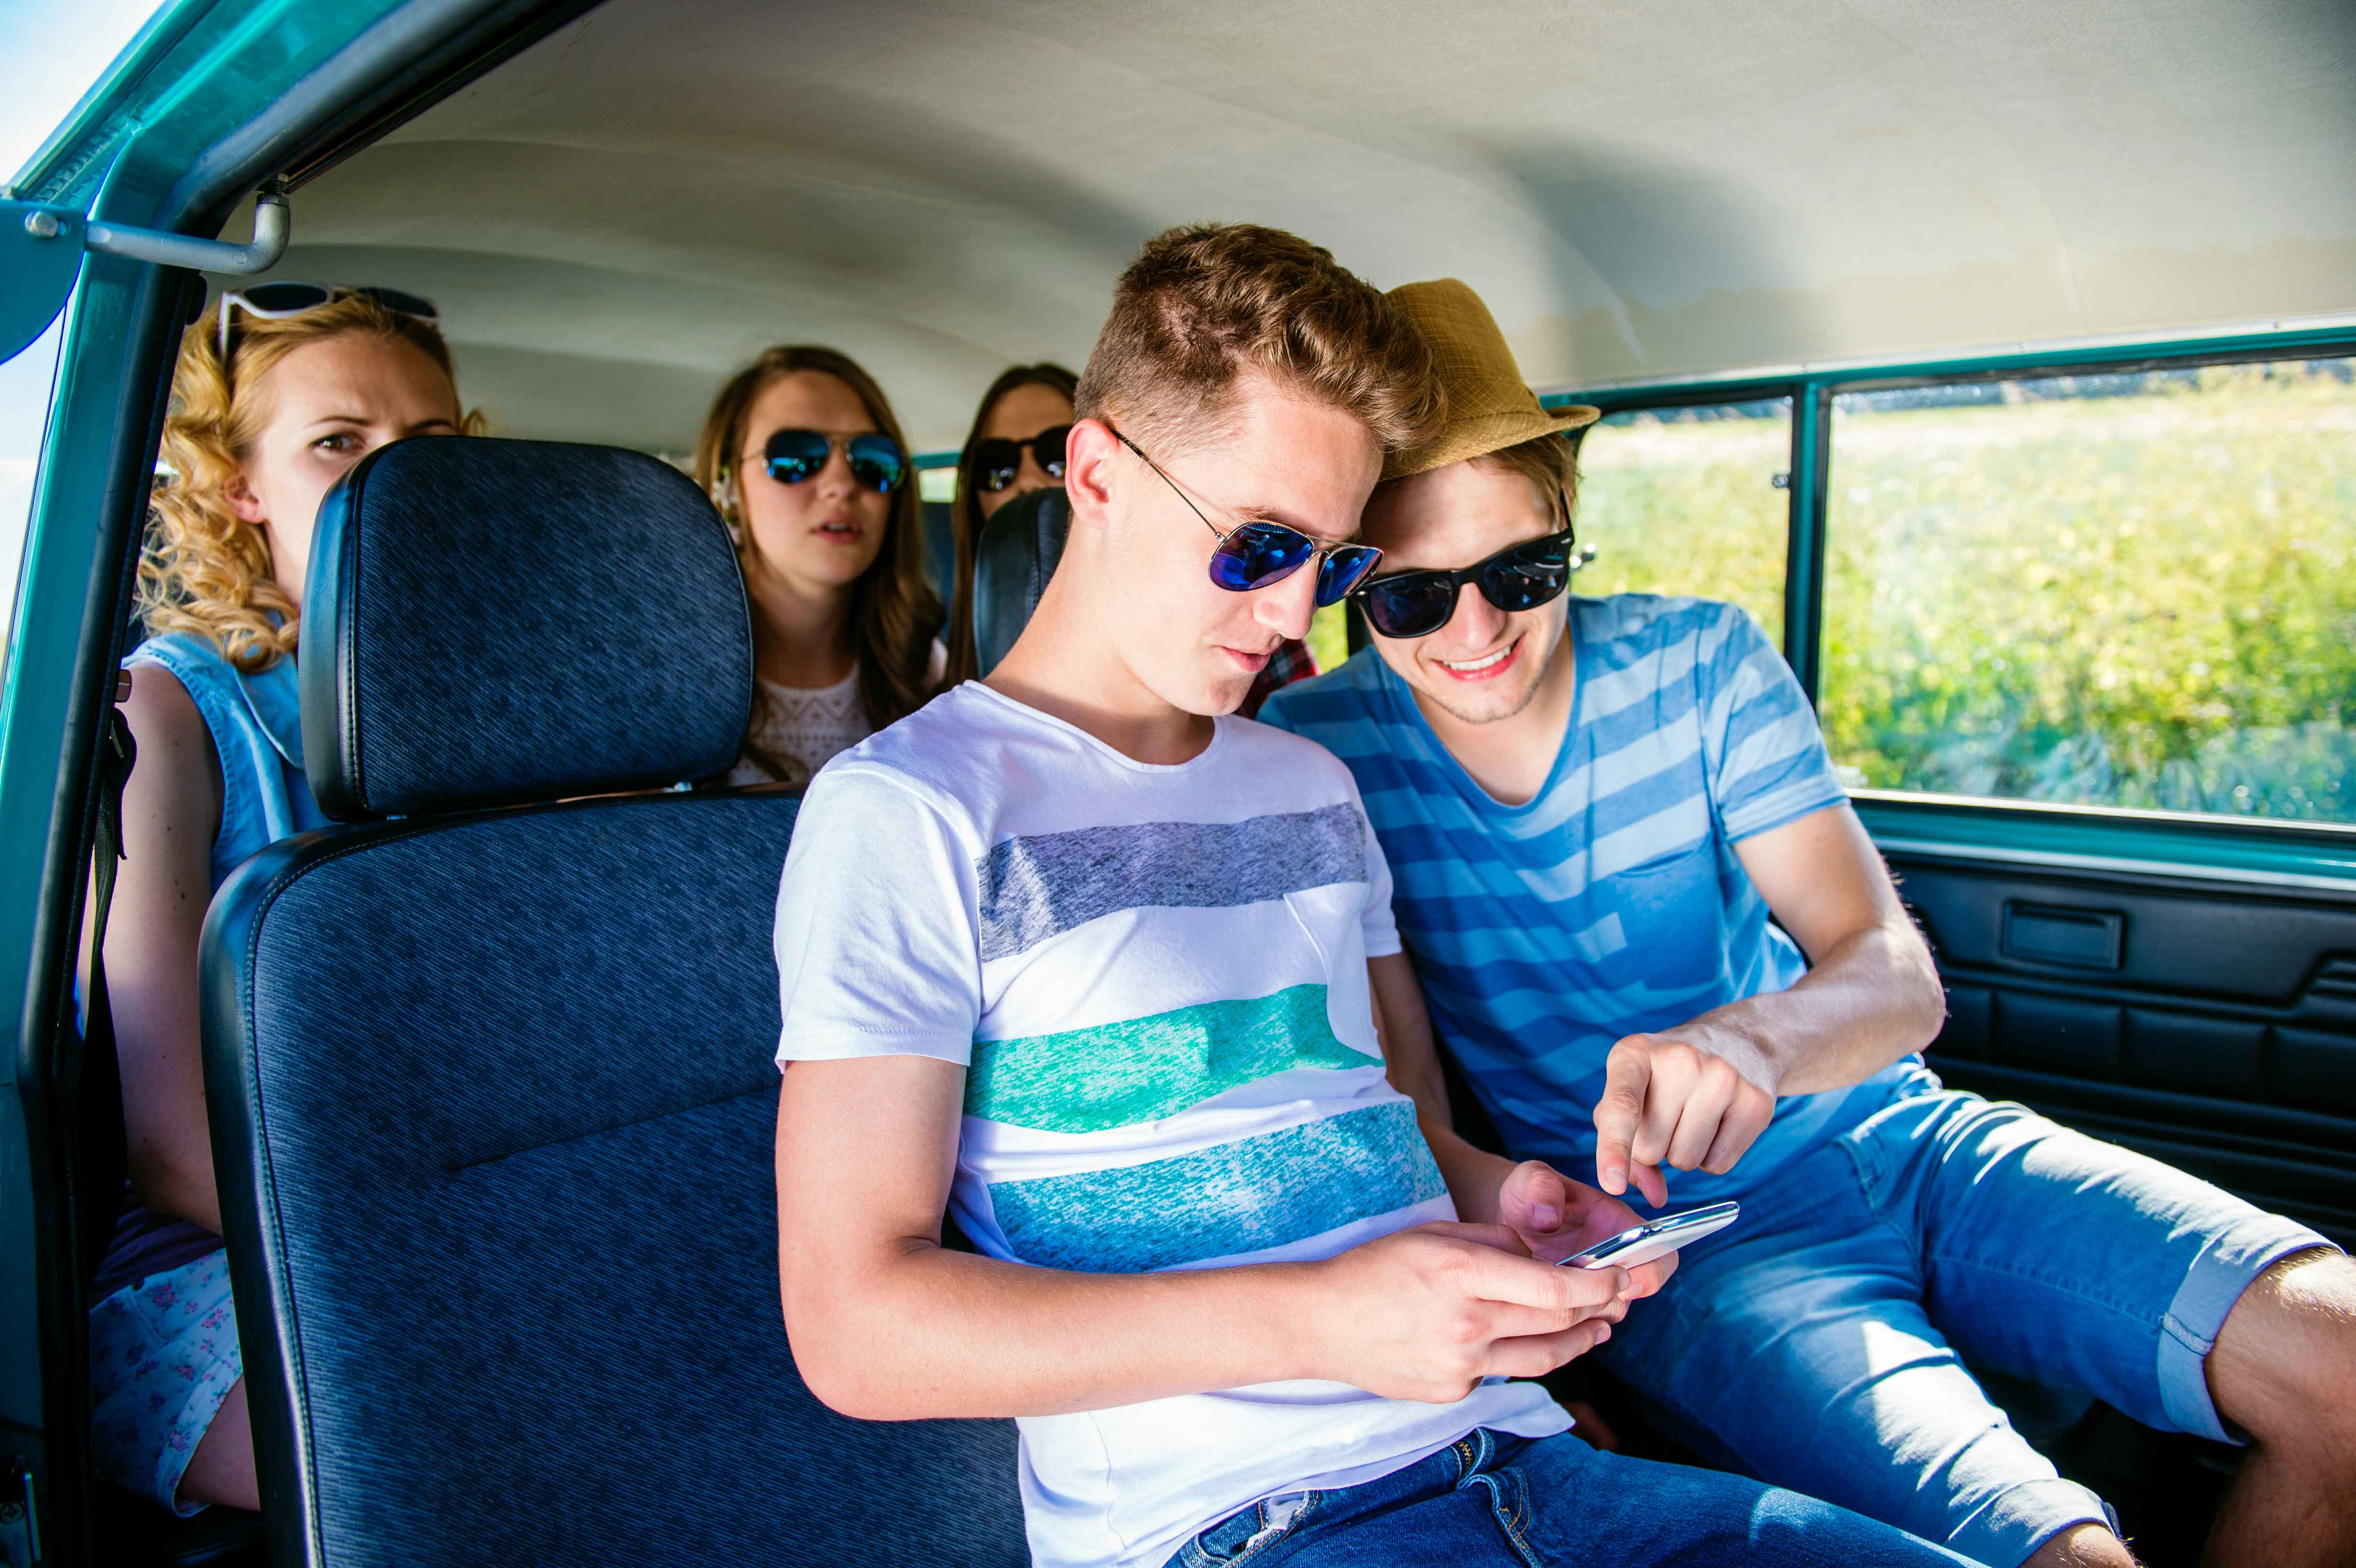 Teenagers on phones